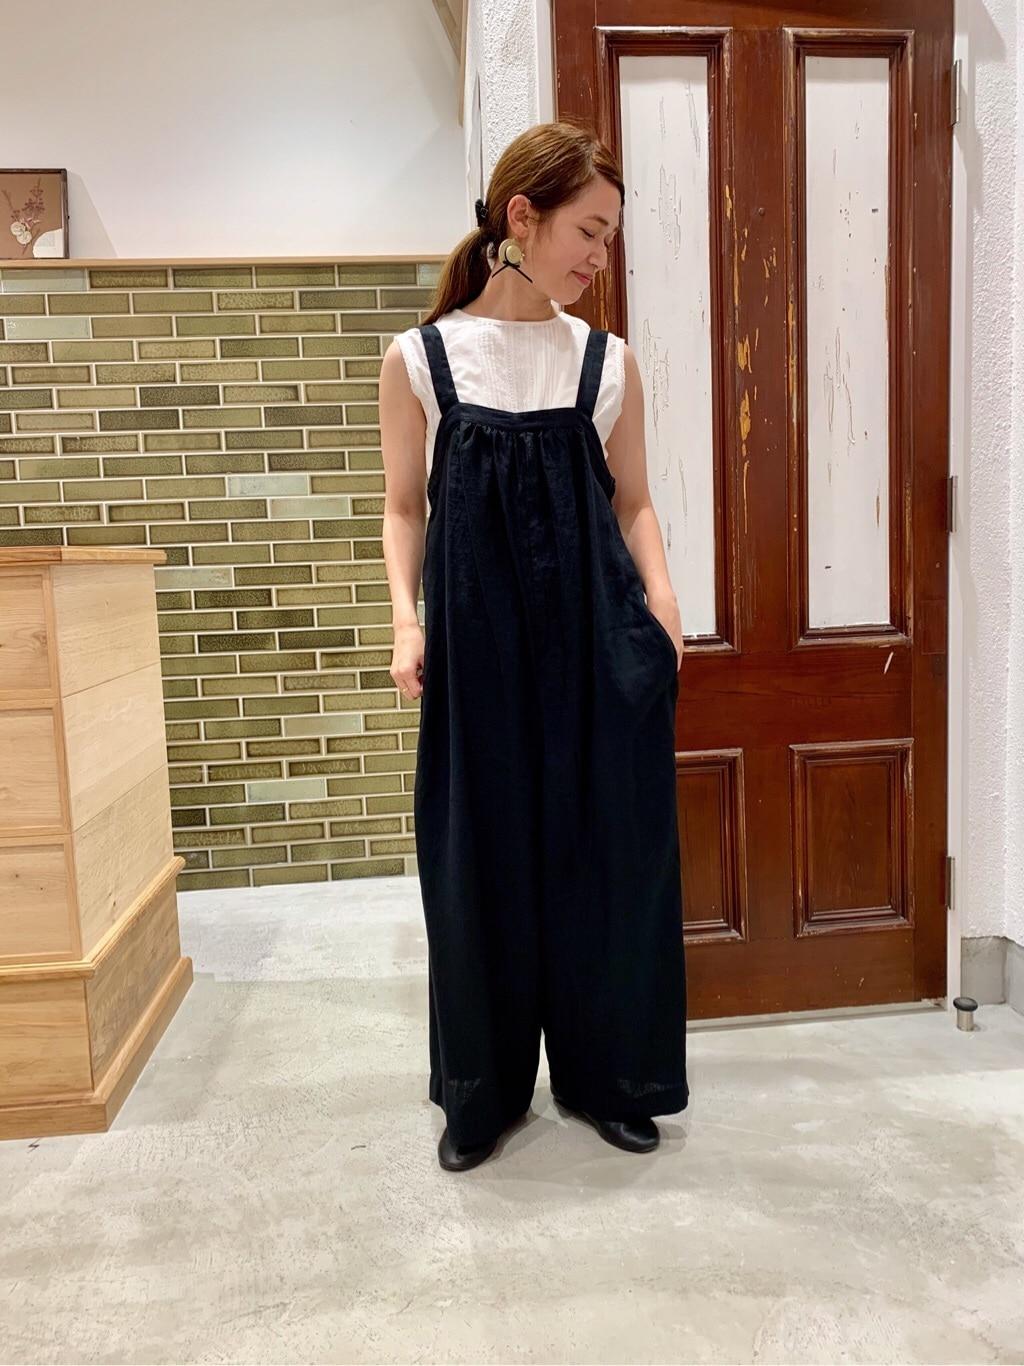 chambre de charme 横浜ジョイナス 身長:160cm 2020.06.15